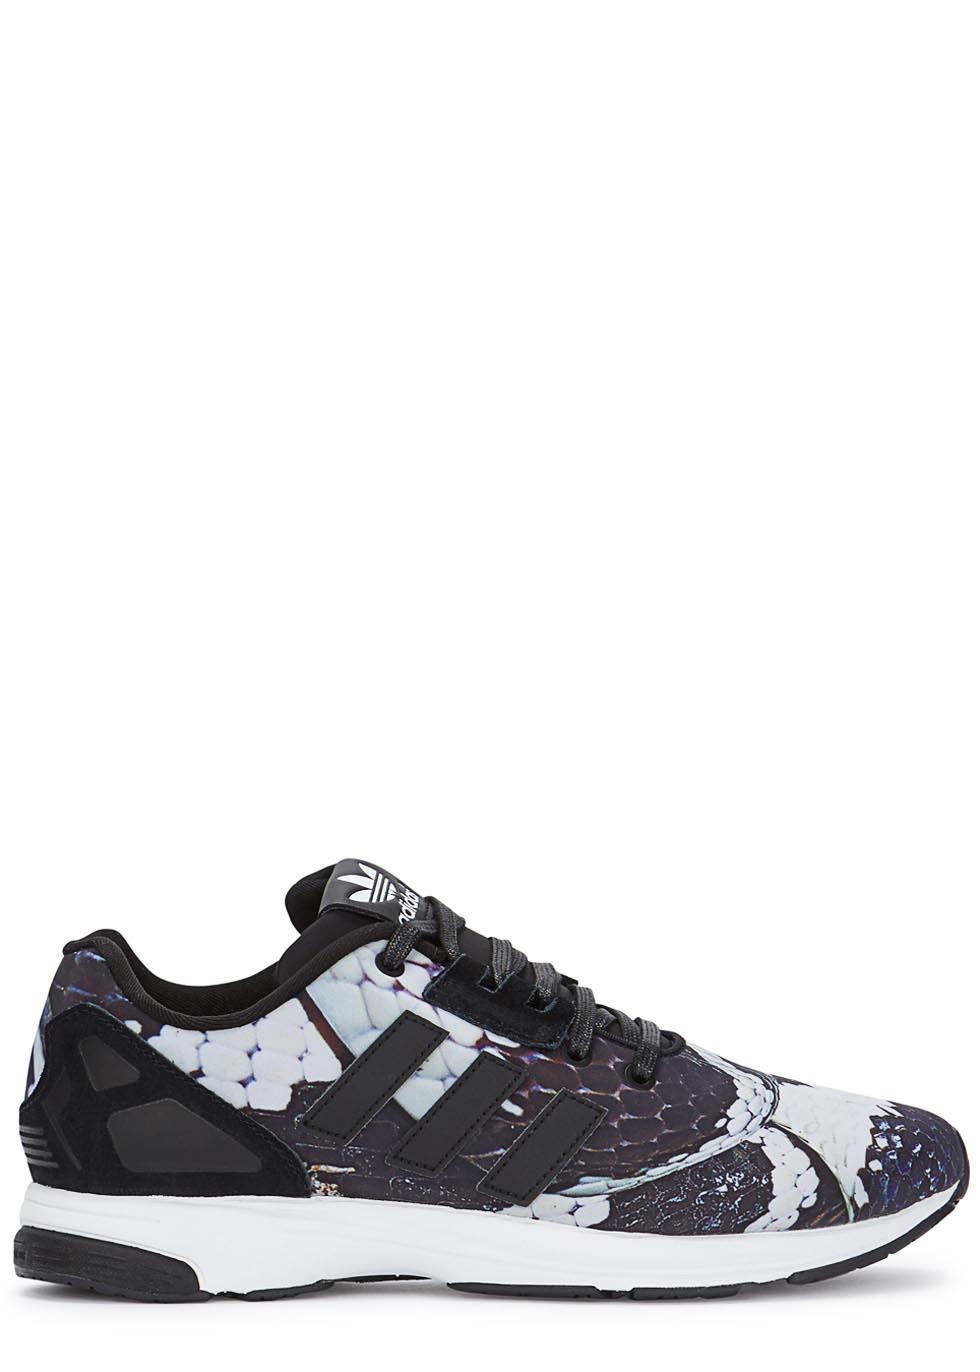 ZX Flux Shoes, Cheap Adidas ZX Flux Sneakers Sale 2017